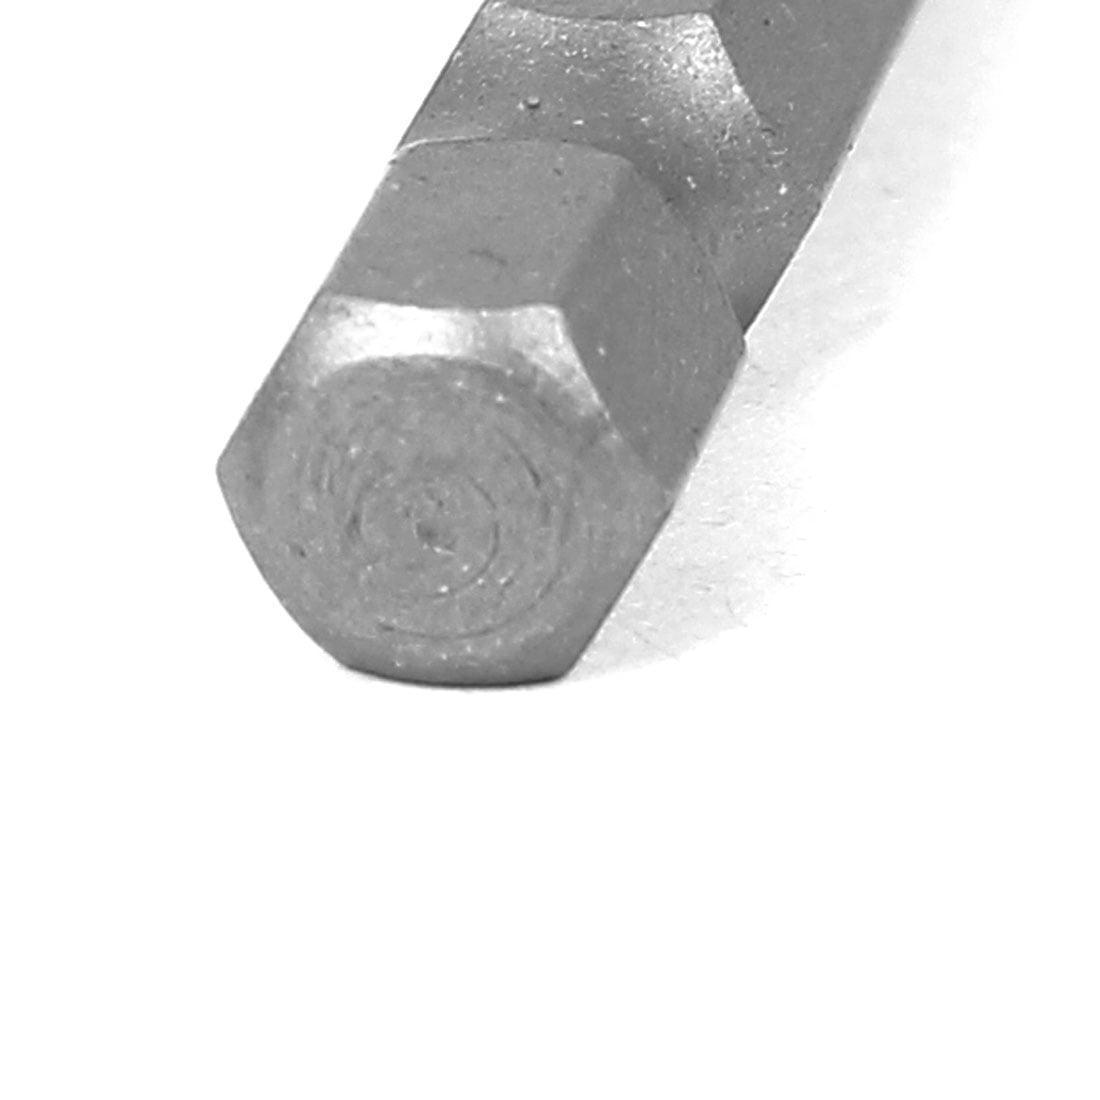 "S2 1/4"" Hex Shank 6mm Tip PH2 Magnetic Phillips Screwdriver Bits 50mm 10pcs - image 1 de 3"